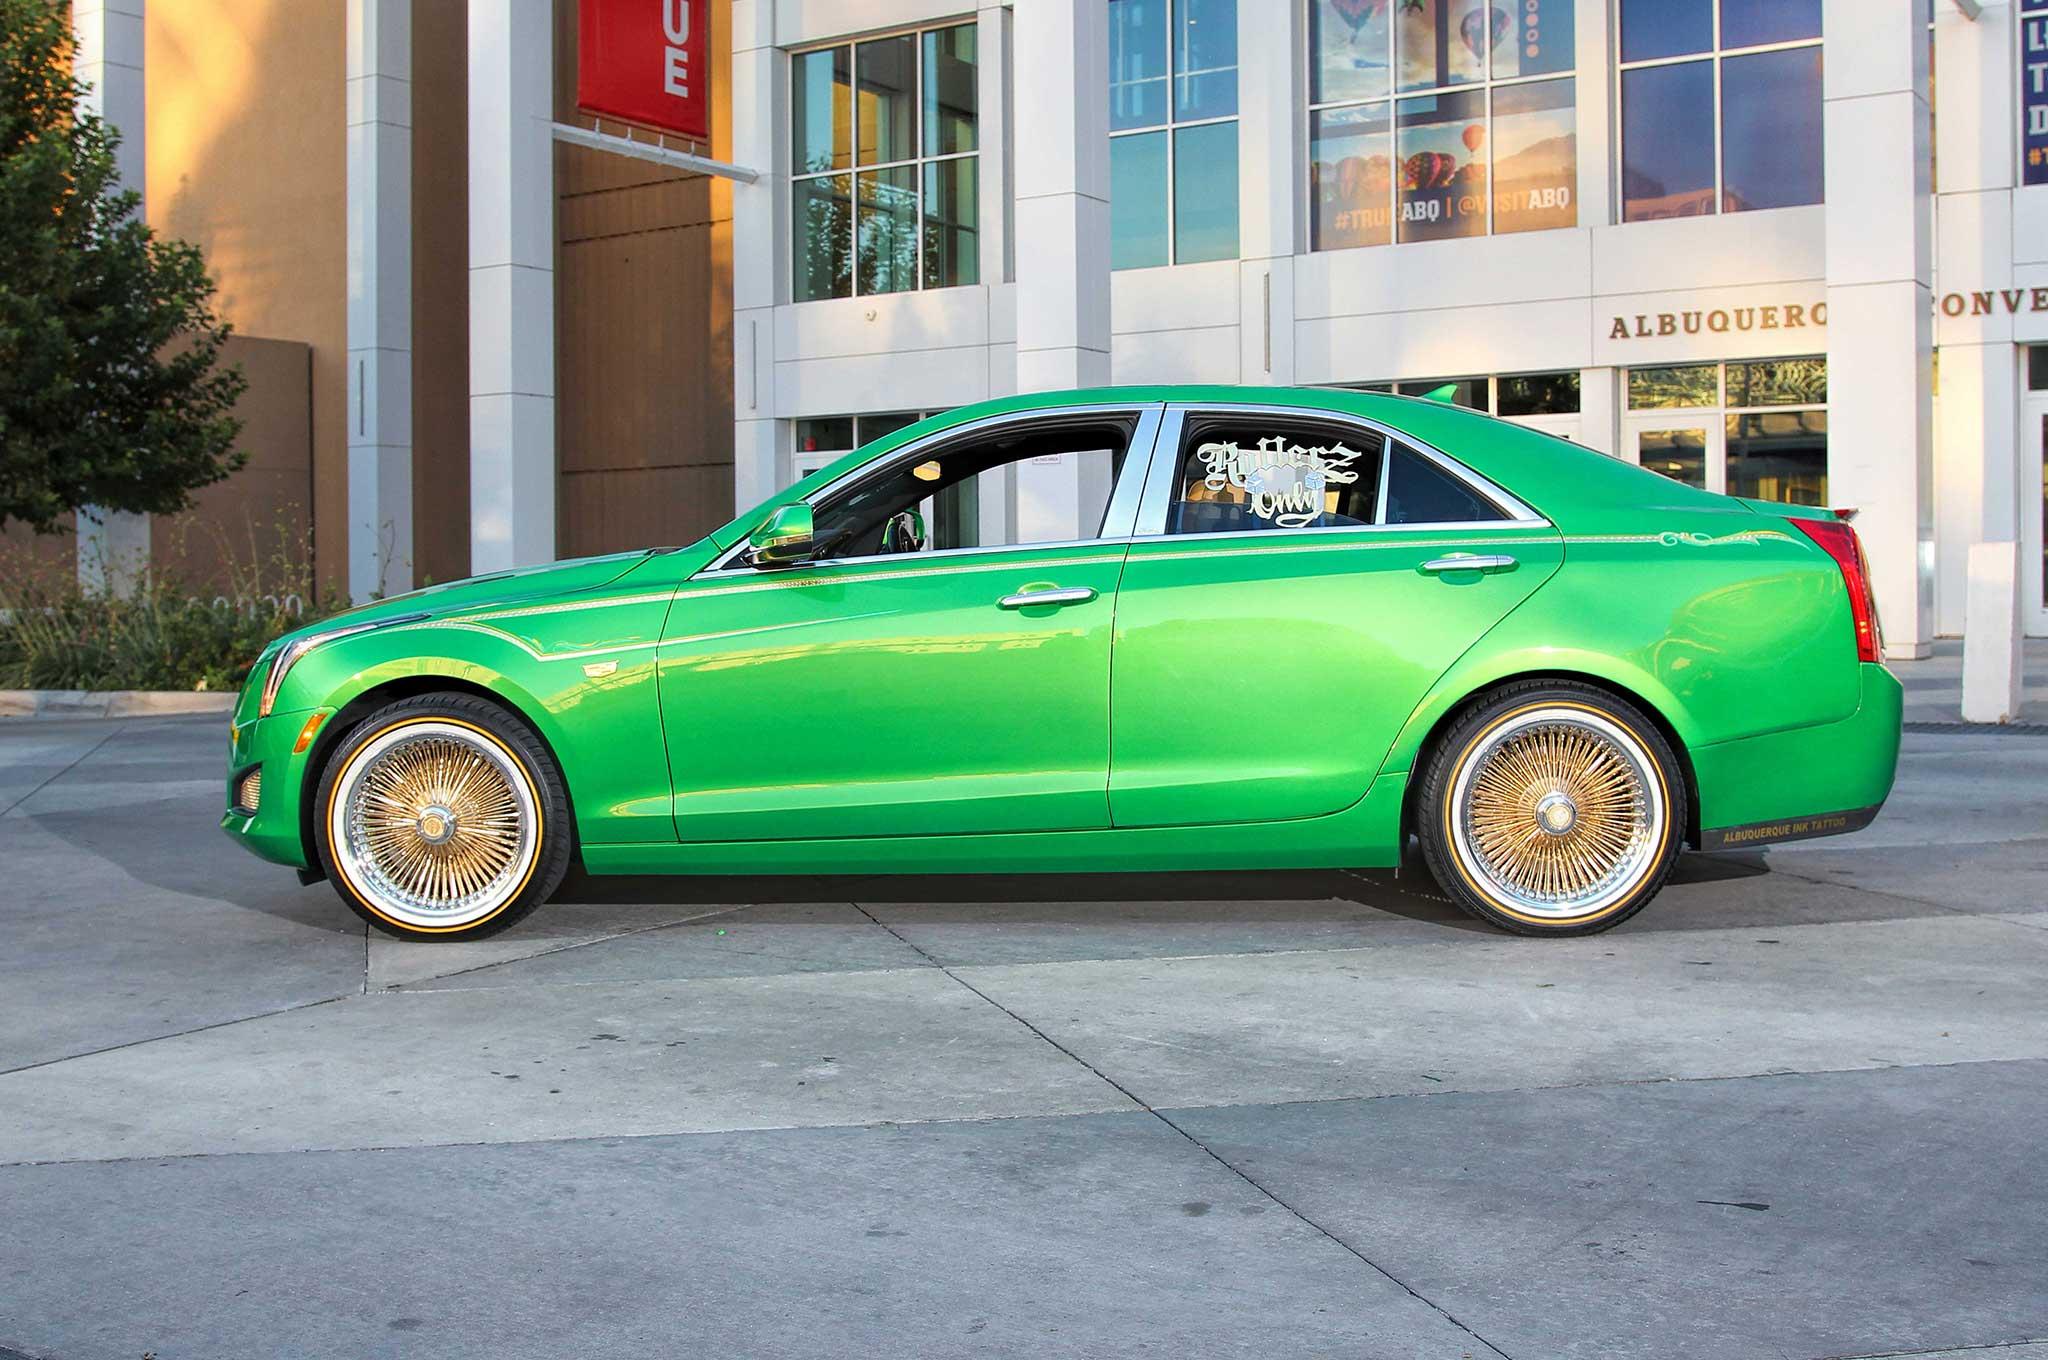 2013 Cadillac Ats Roller Boy